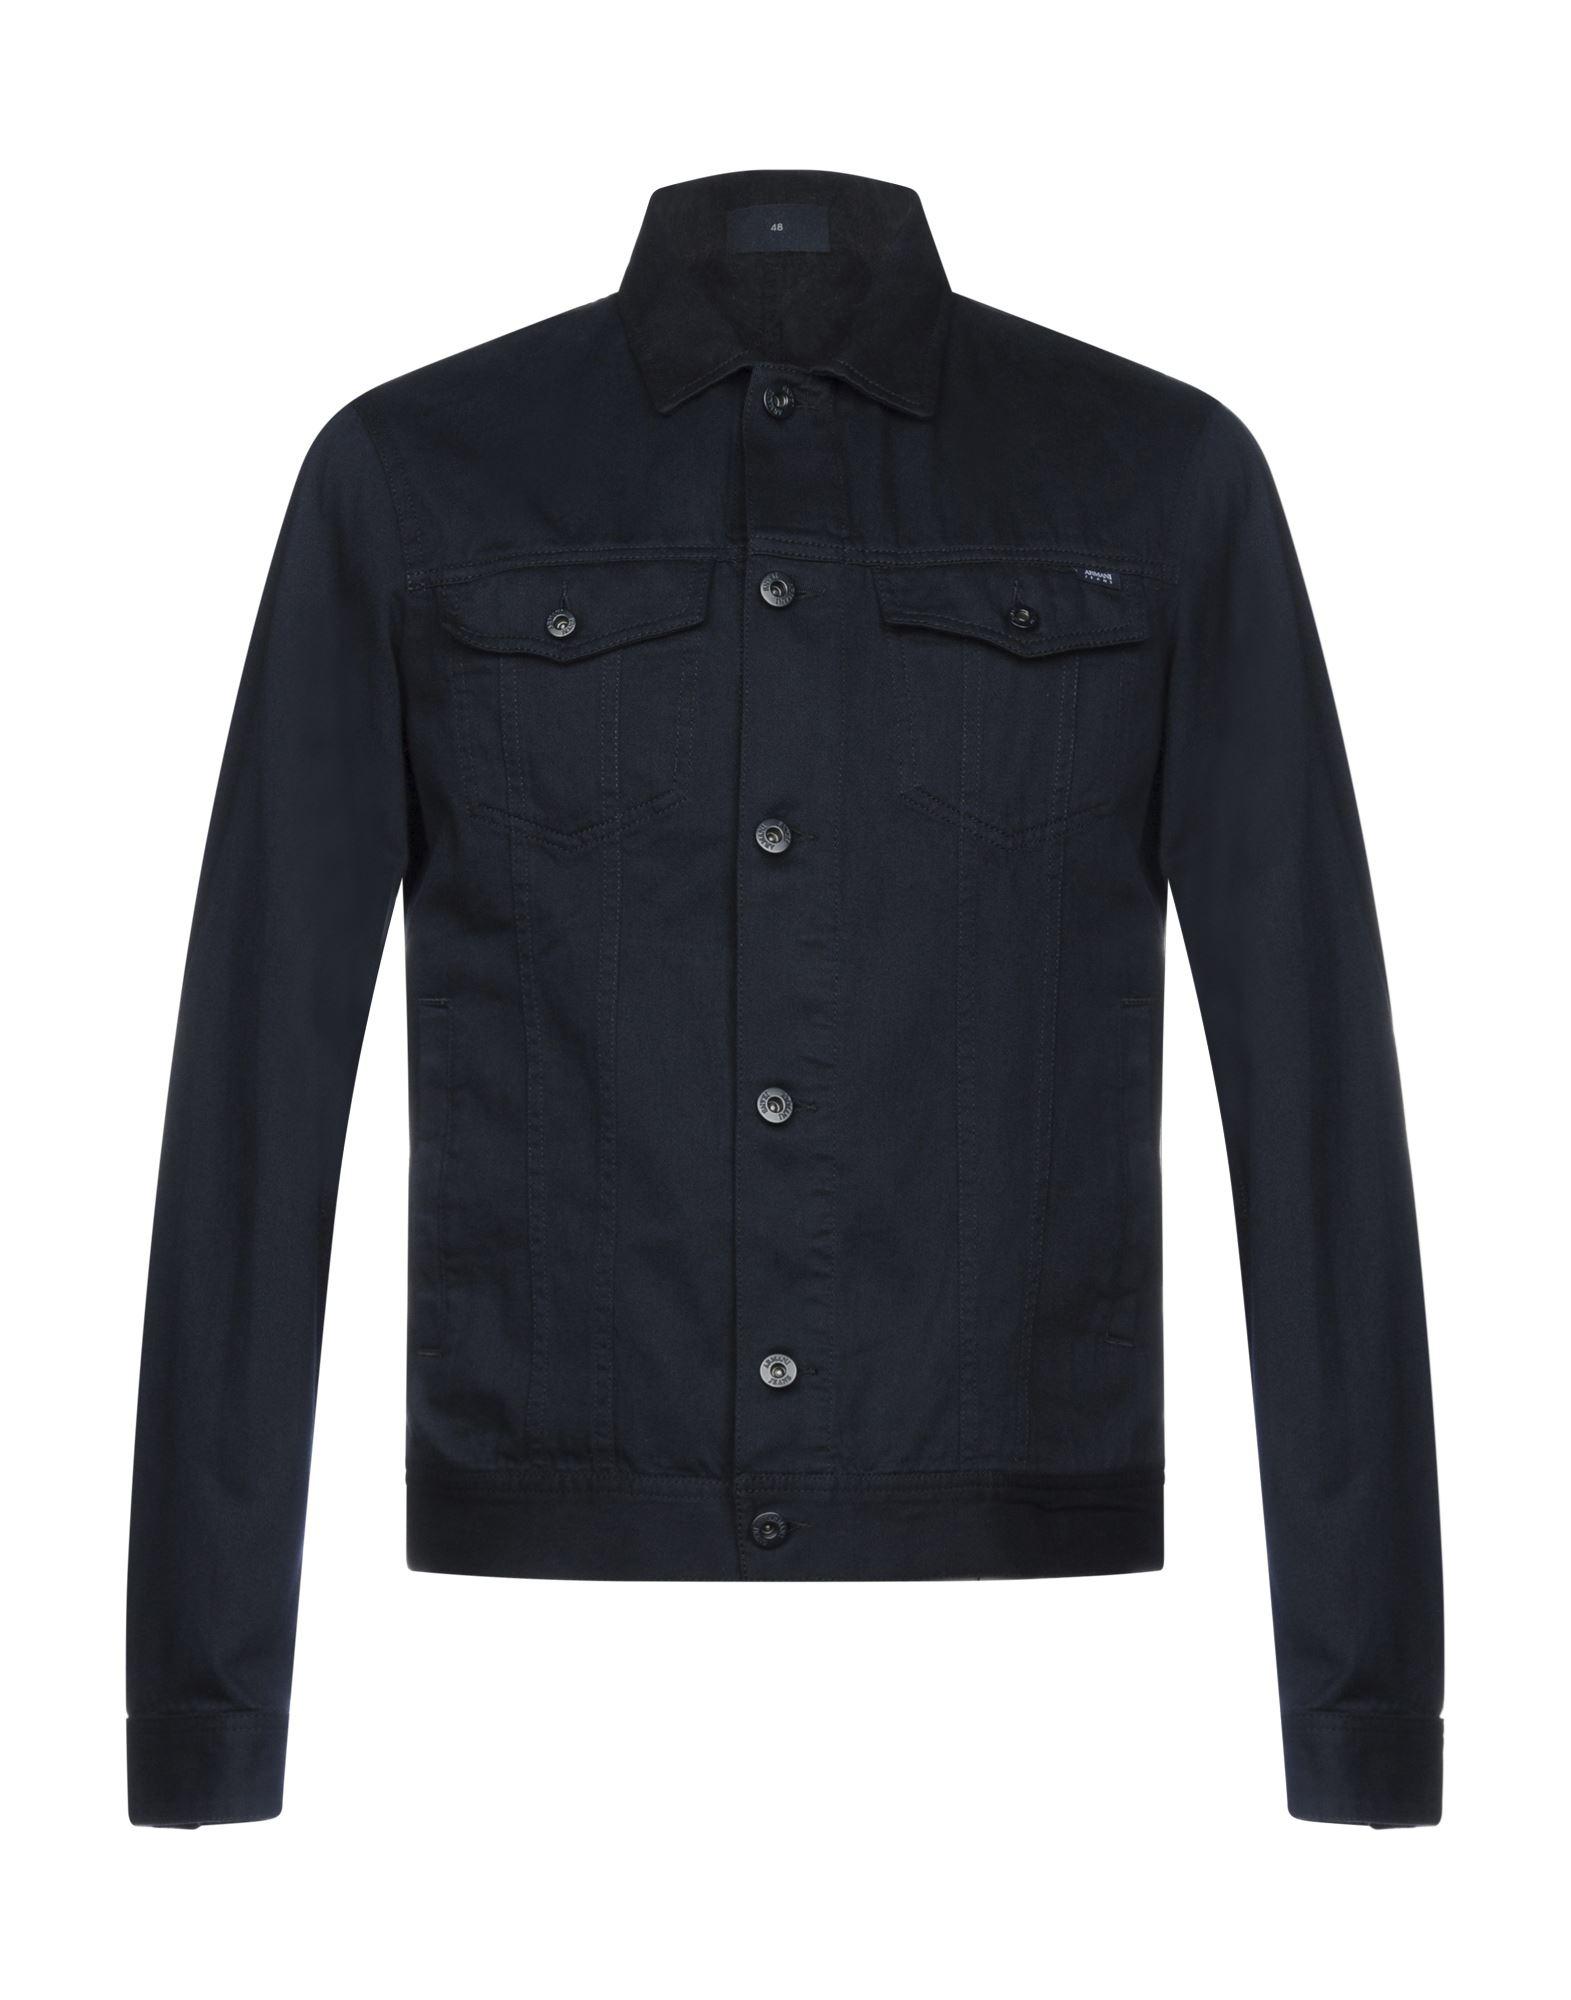 Фото - ARMANI JEANS Куртка armani jeans верхняя одежда из кожи